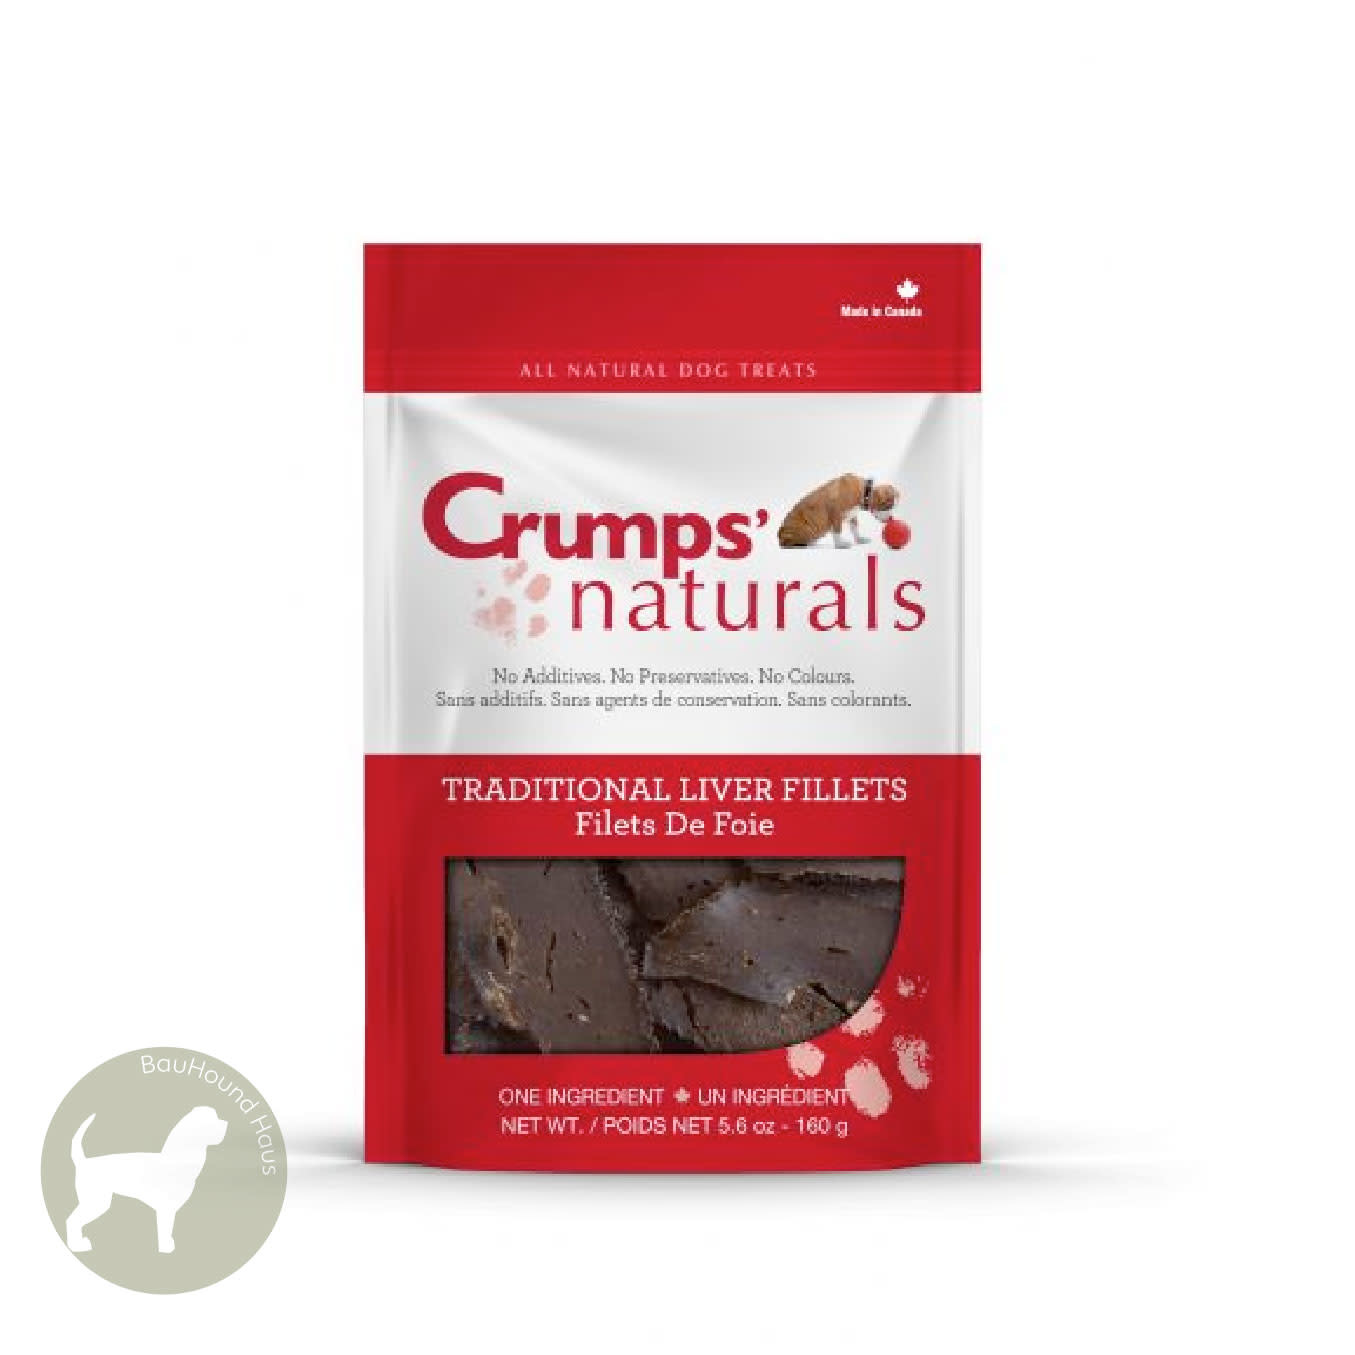 Crumps Crumps Natural Beef Liver Fillet, 330g